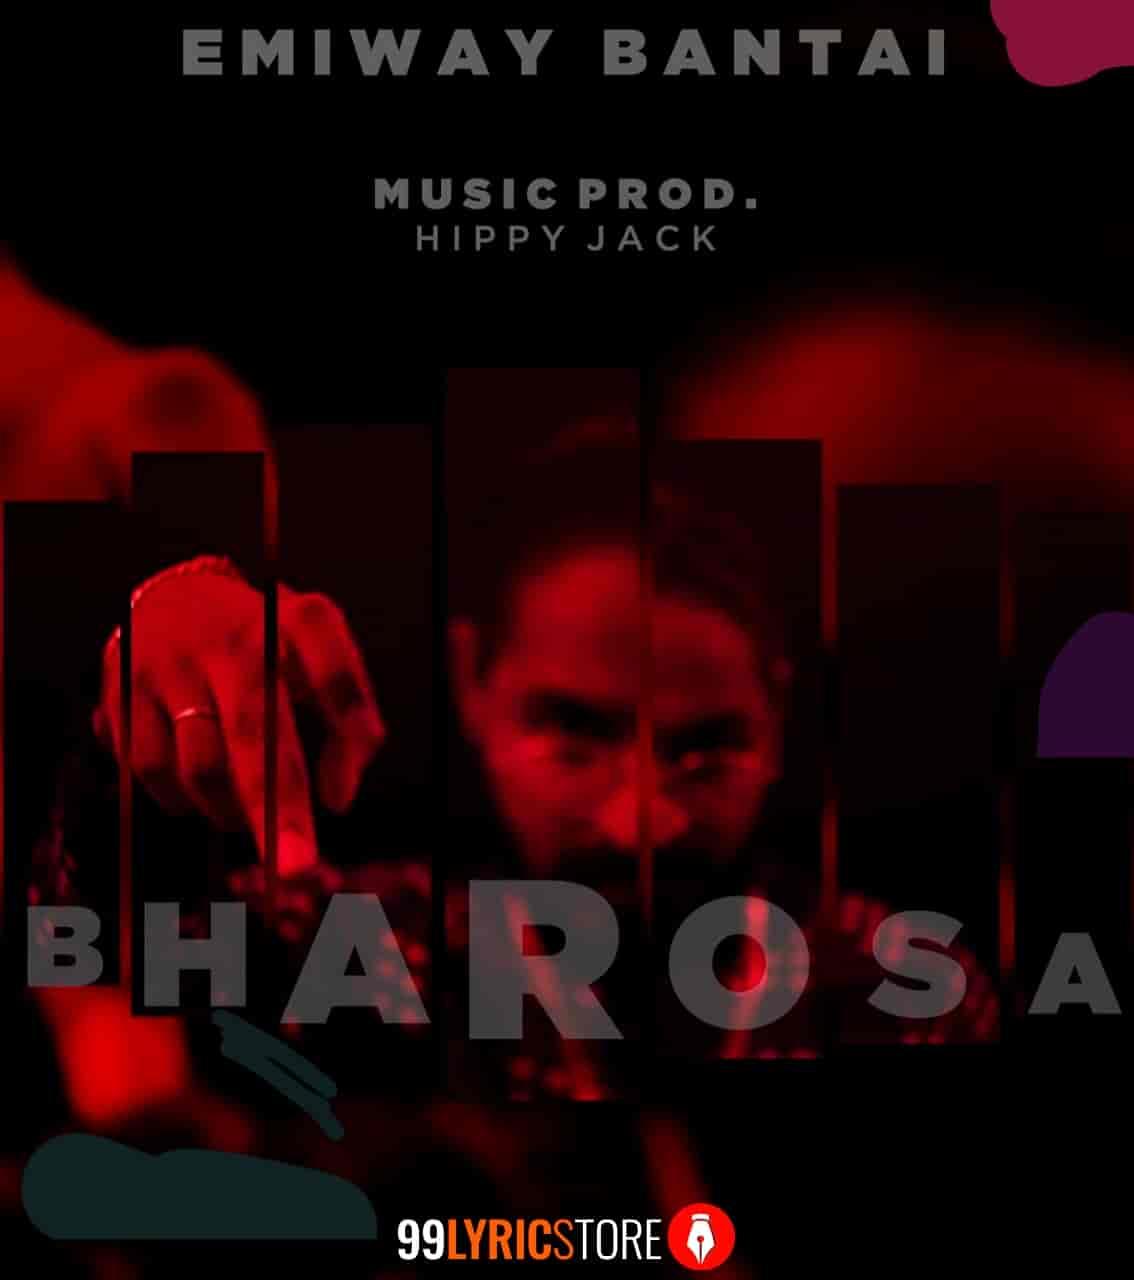 Bharosa Rap Song Images By Emiway Bantai